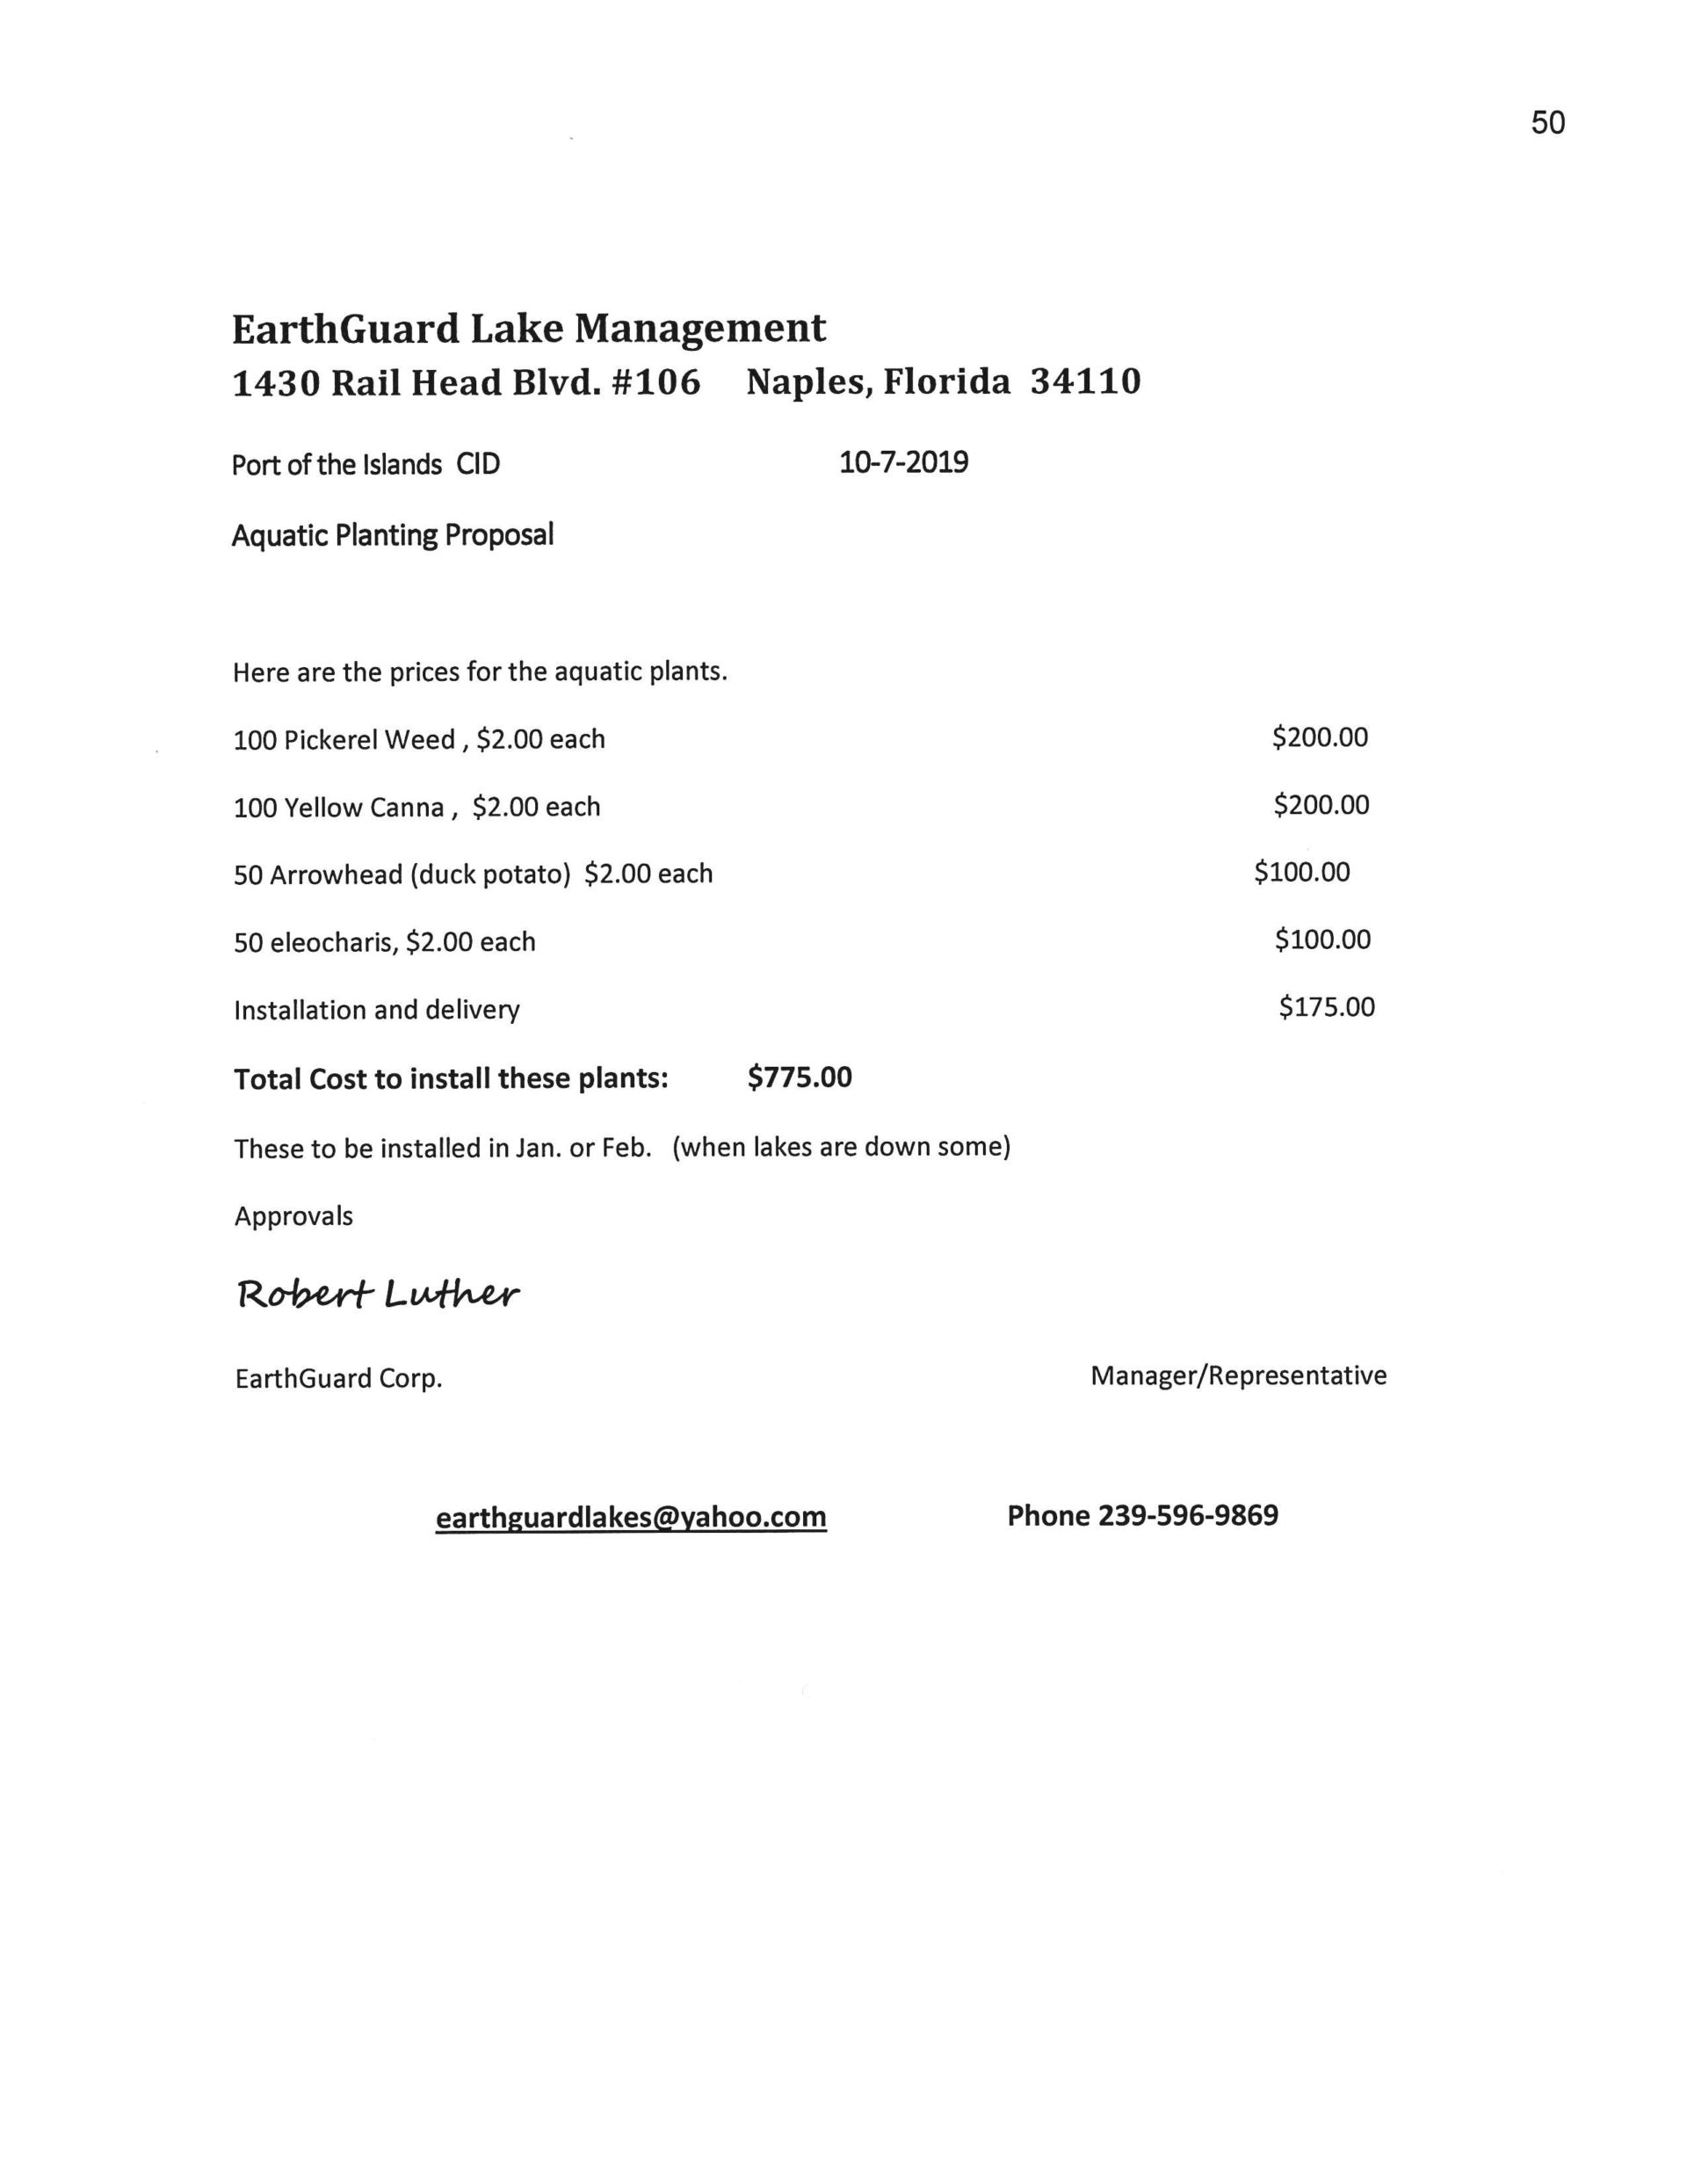 Earthguard proposal for planting aquatics 10-7-2019